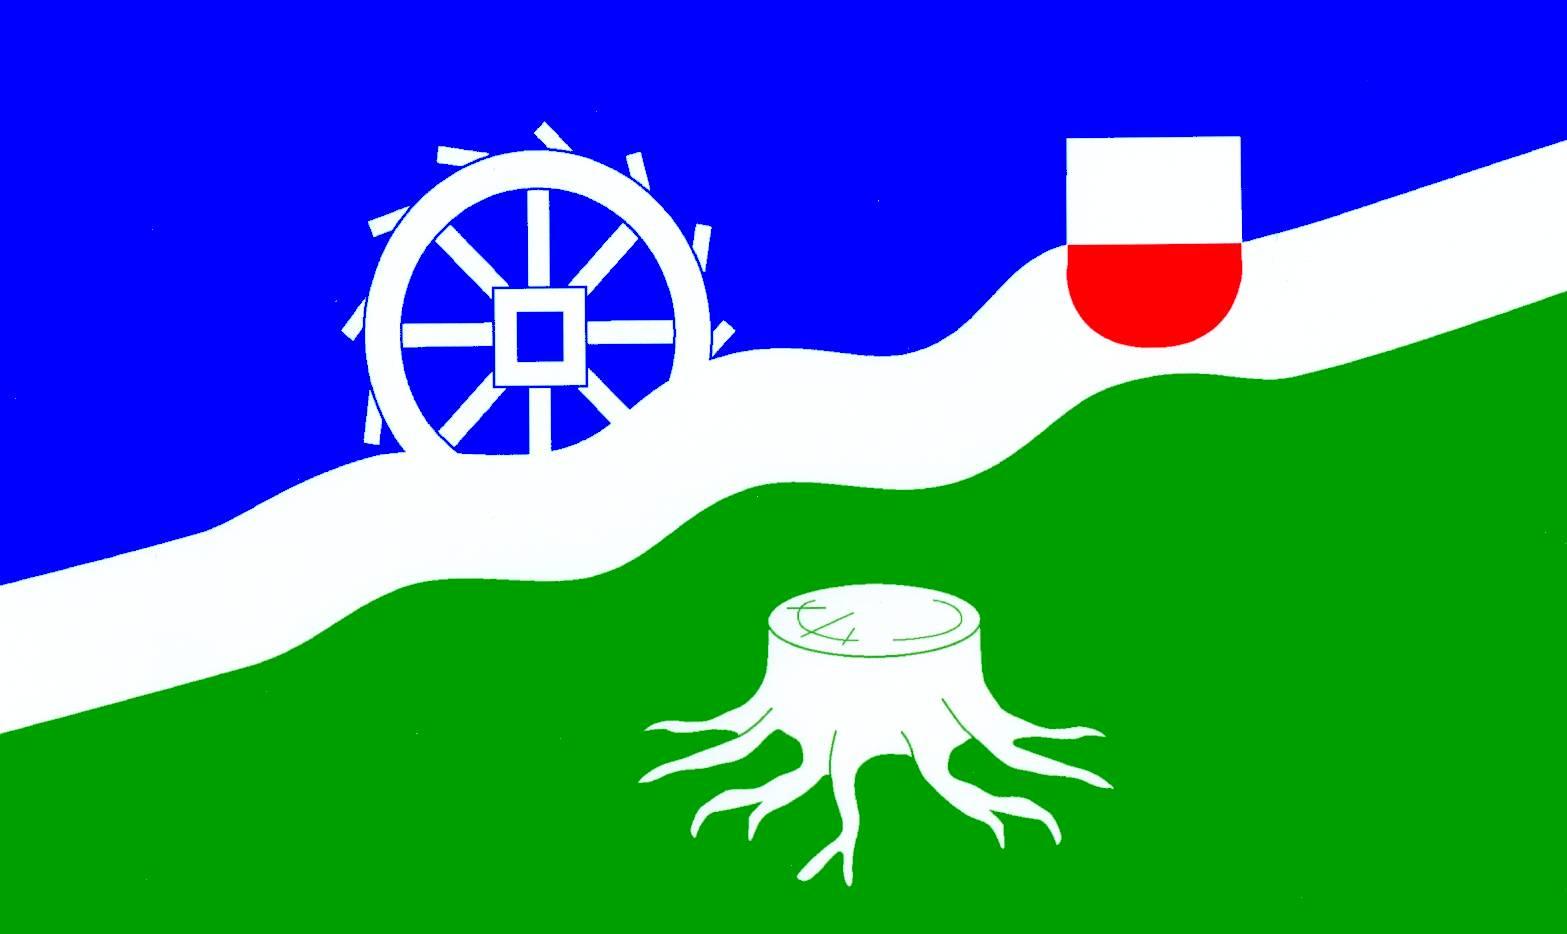 Flagge GemeindeSierksrade, Kreis Herzogtum Lauenburg